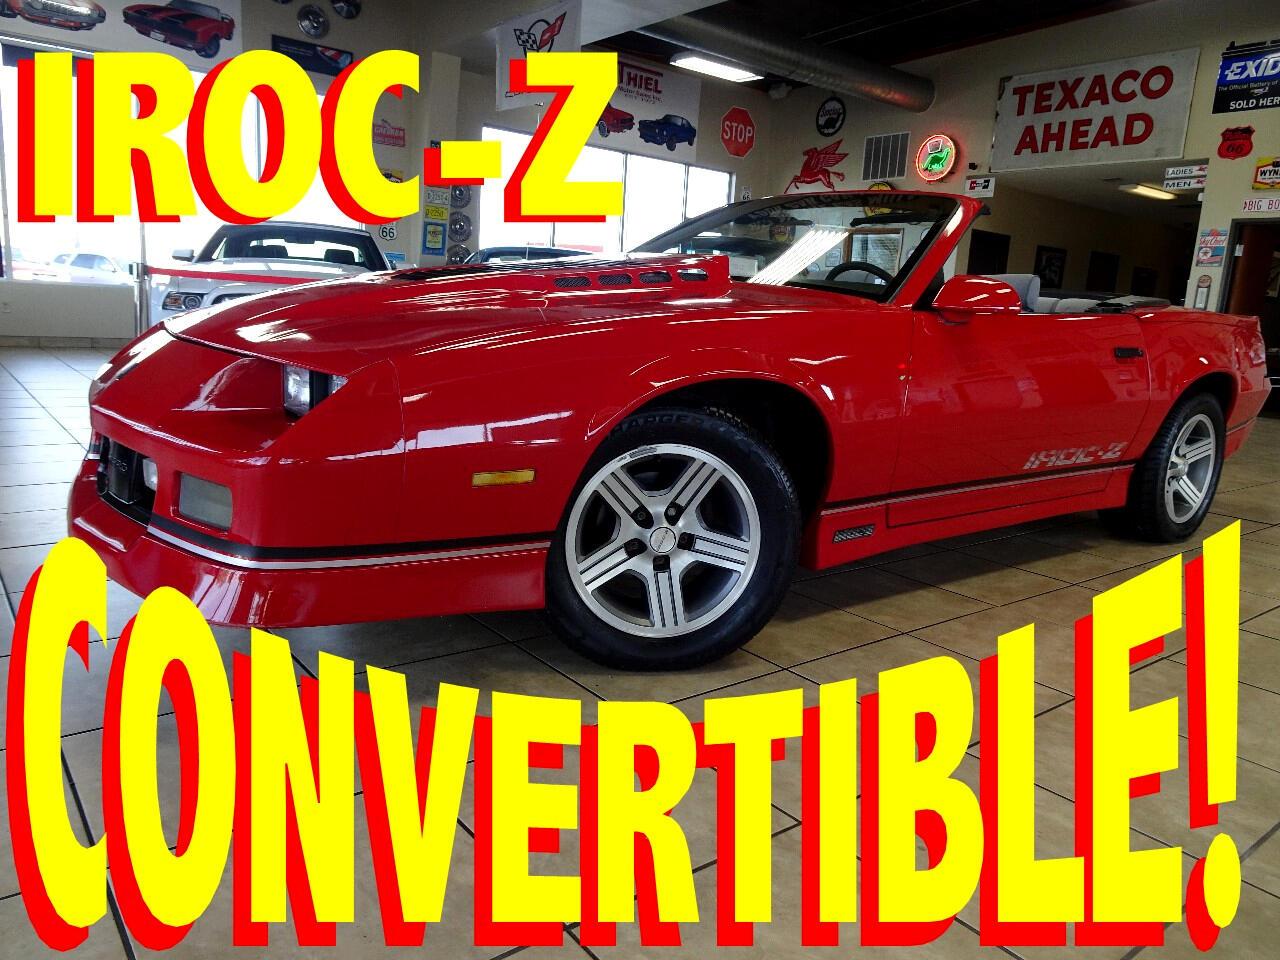 1988 Chevrolet Camaro IROC Z convertible